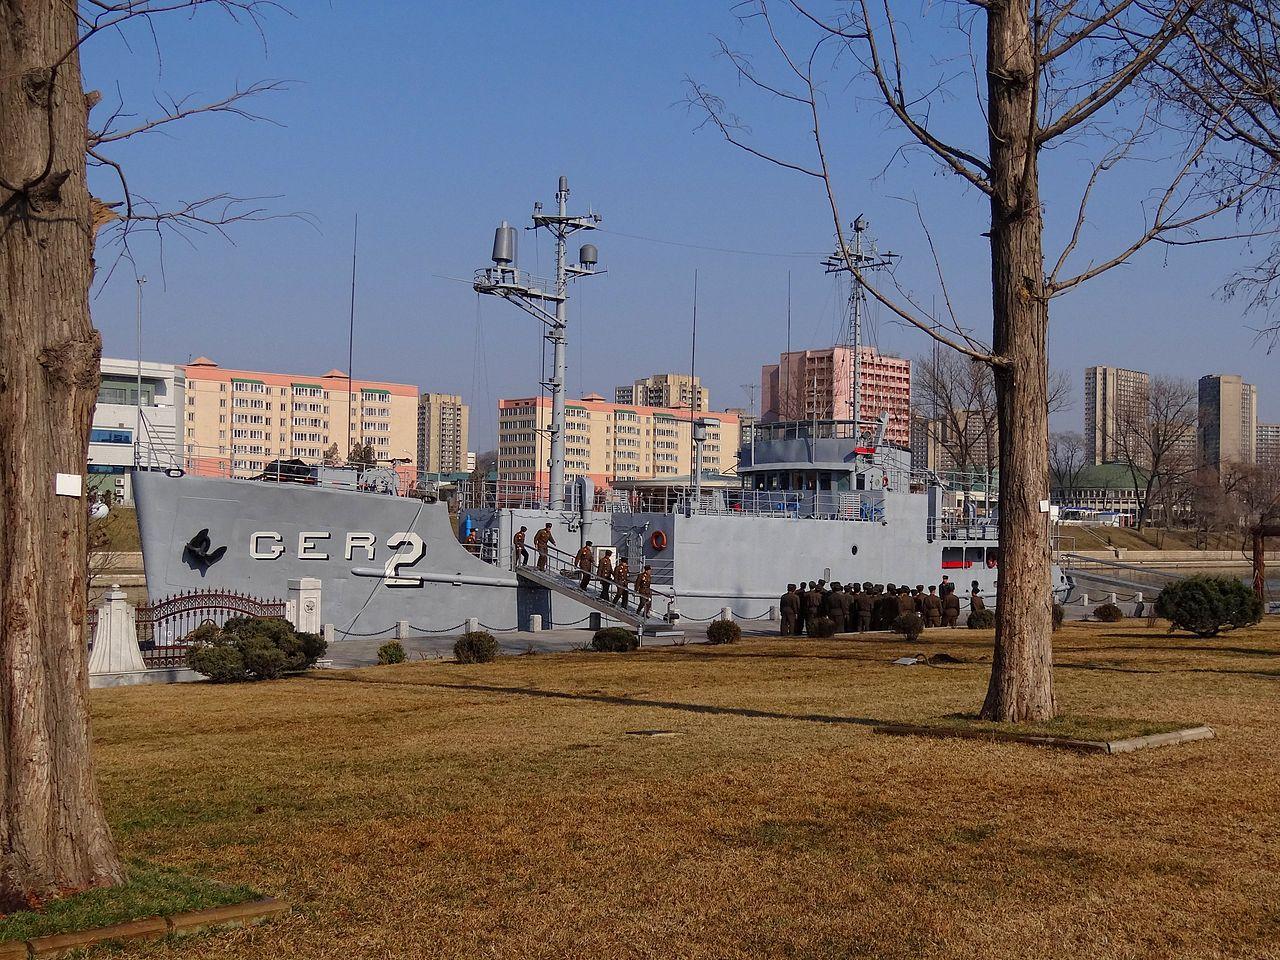 Pueblo-at-Pyongyang-Museum-2014